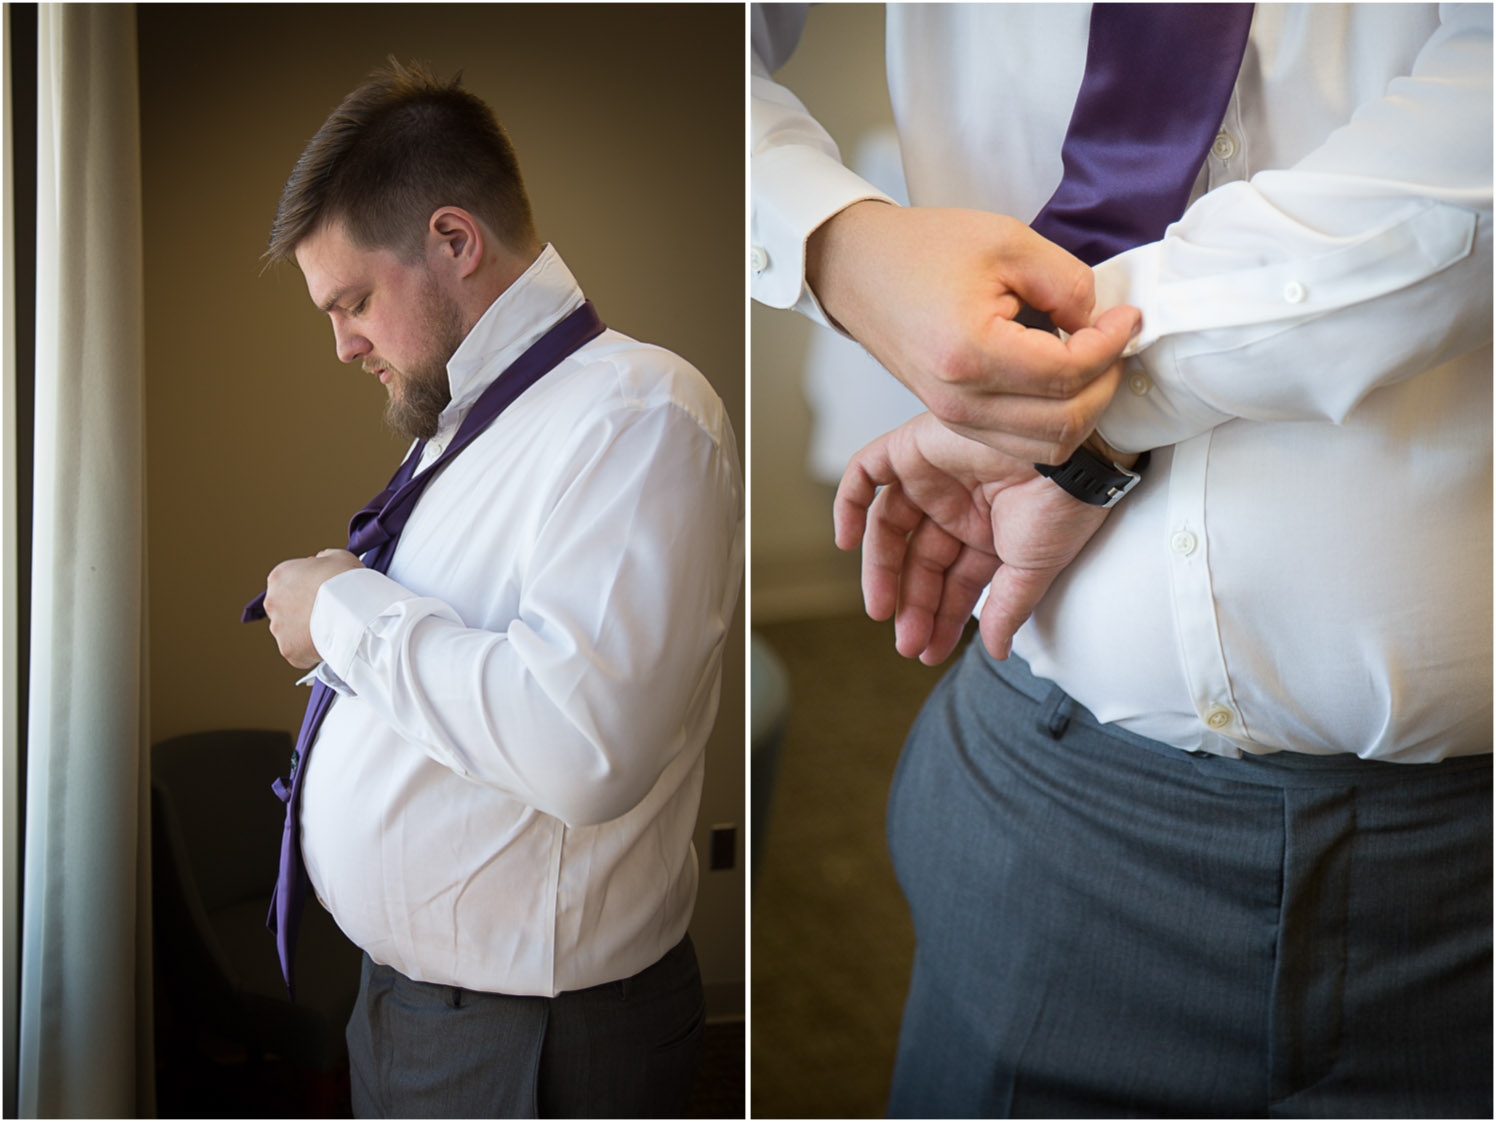 04-university-of-minnesota-campus-club-wedding-photographer-groom-getting-ready-purple-tie-mahonen-photography.jpg